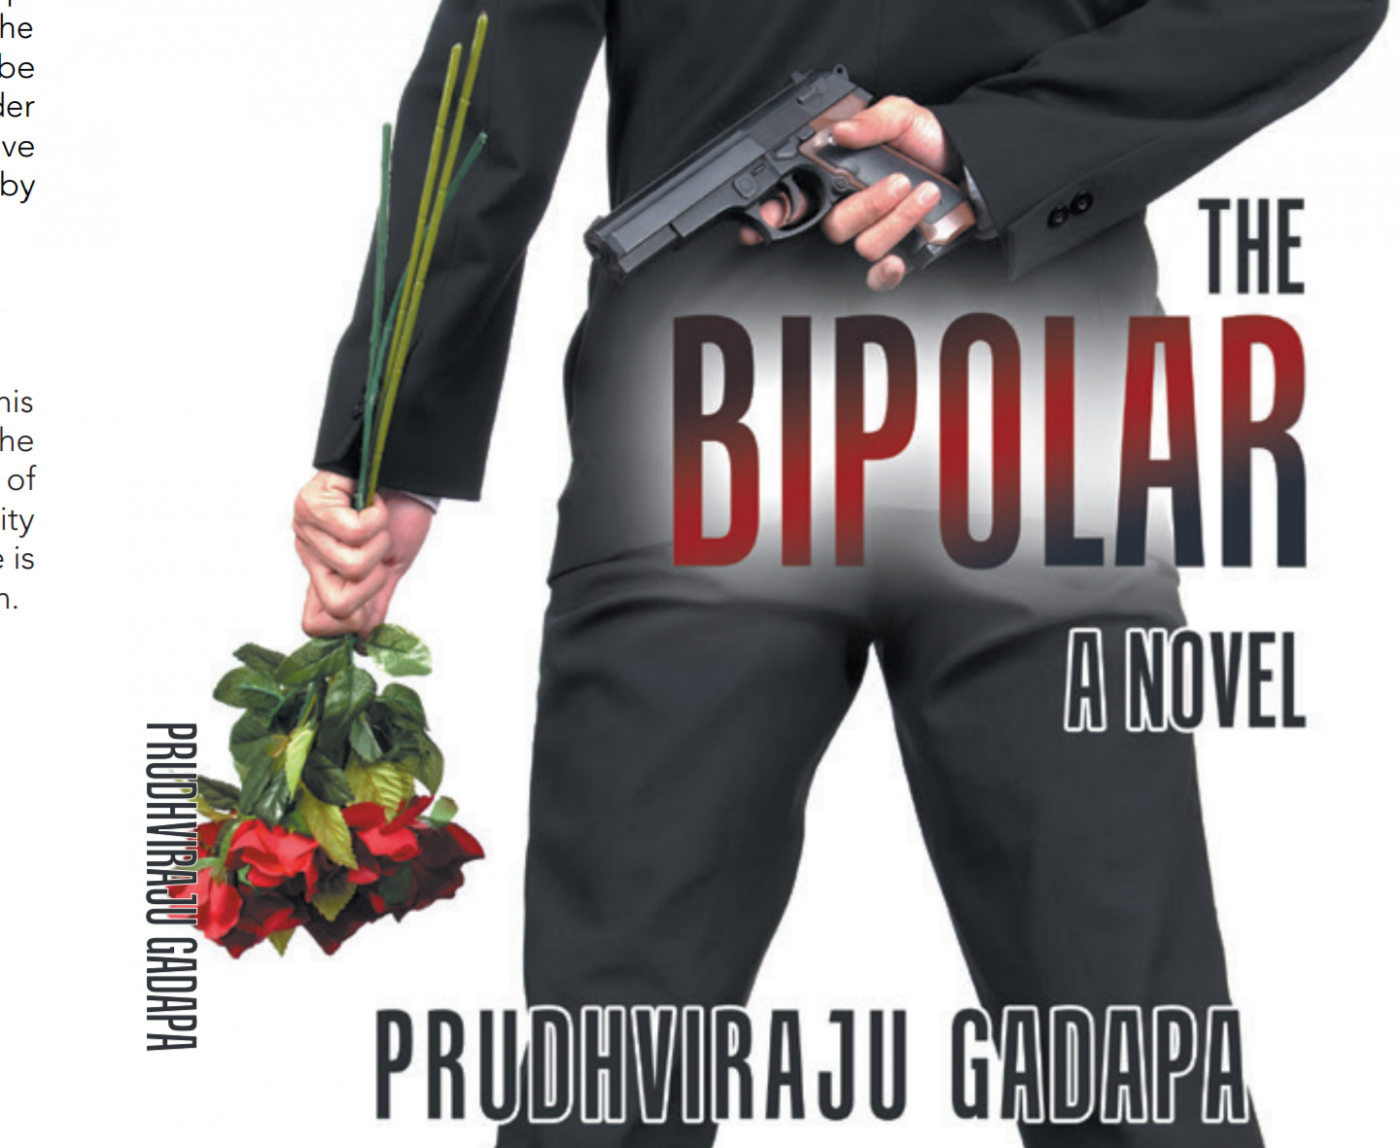 The Bipolar Book Series